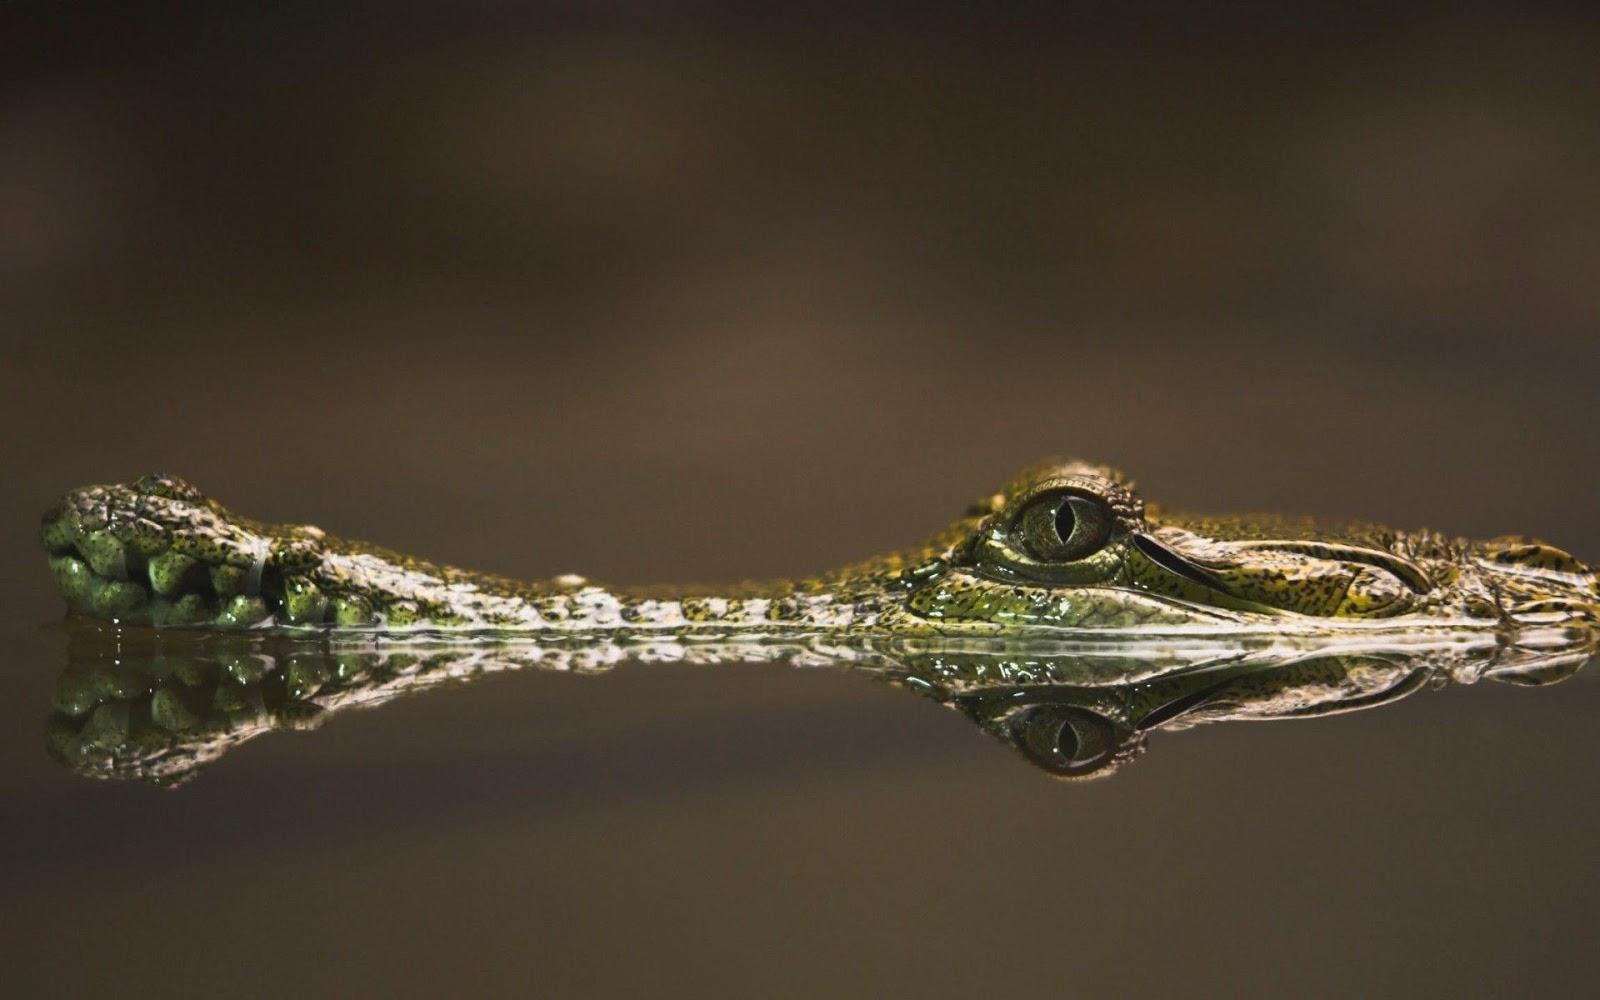 Baby Alligator photo